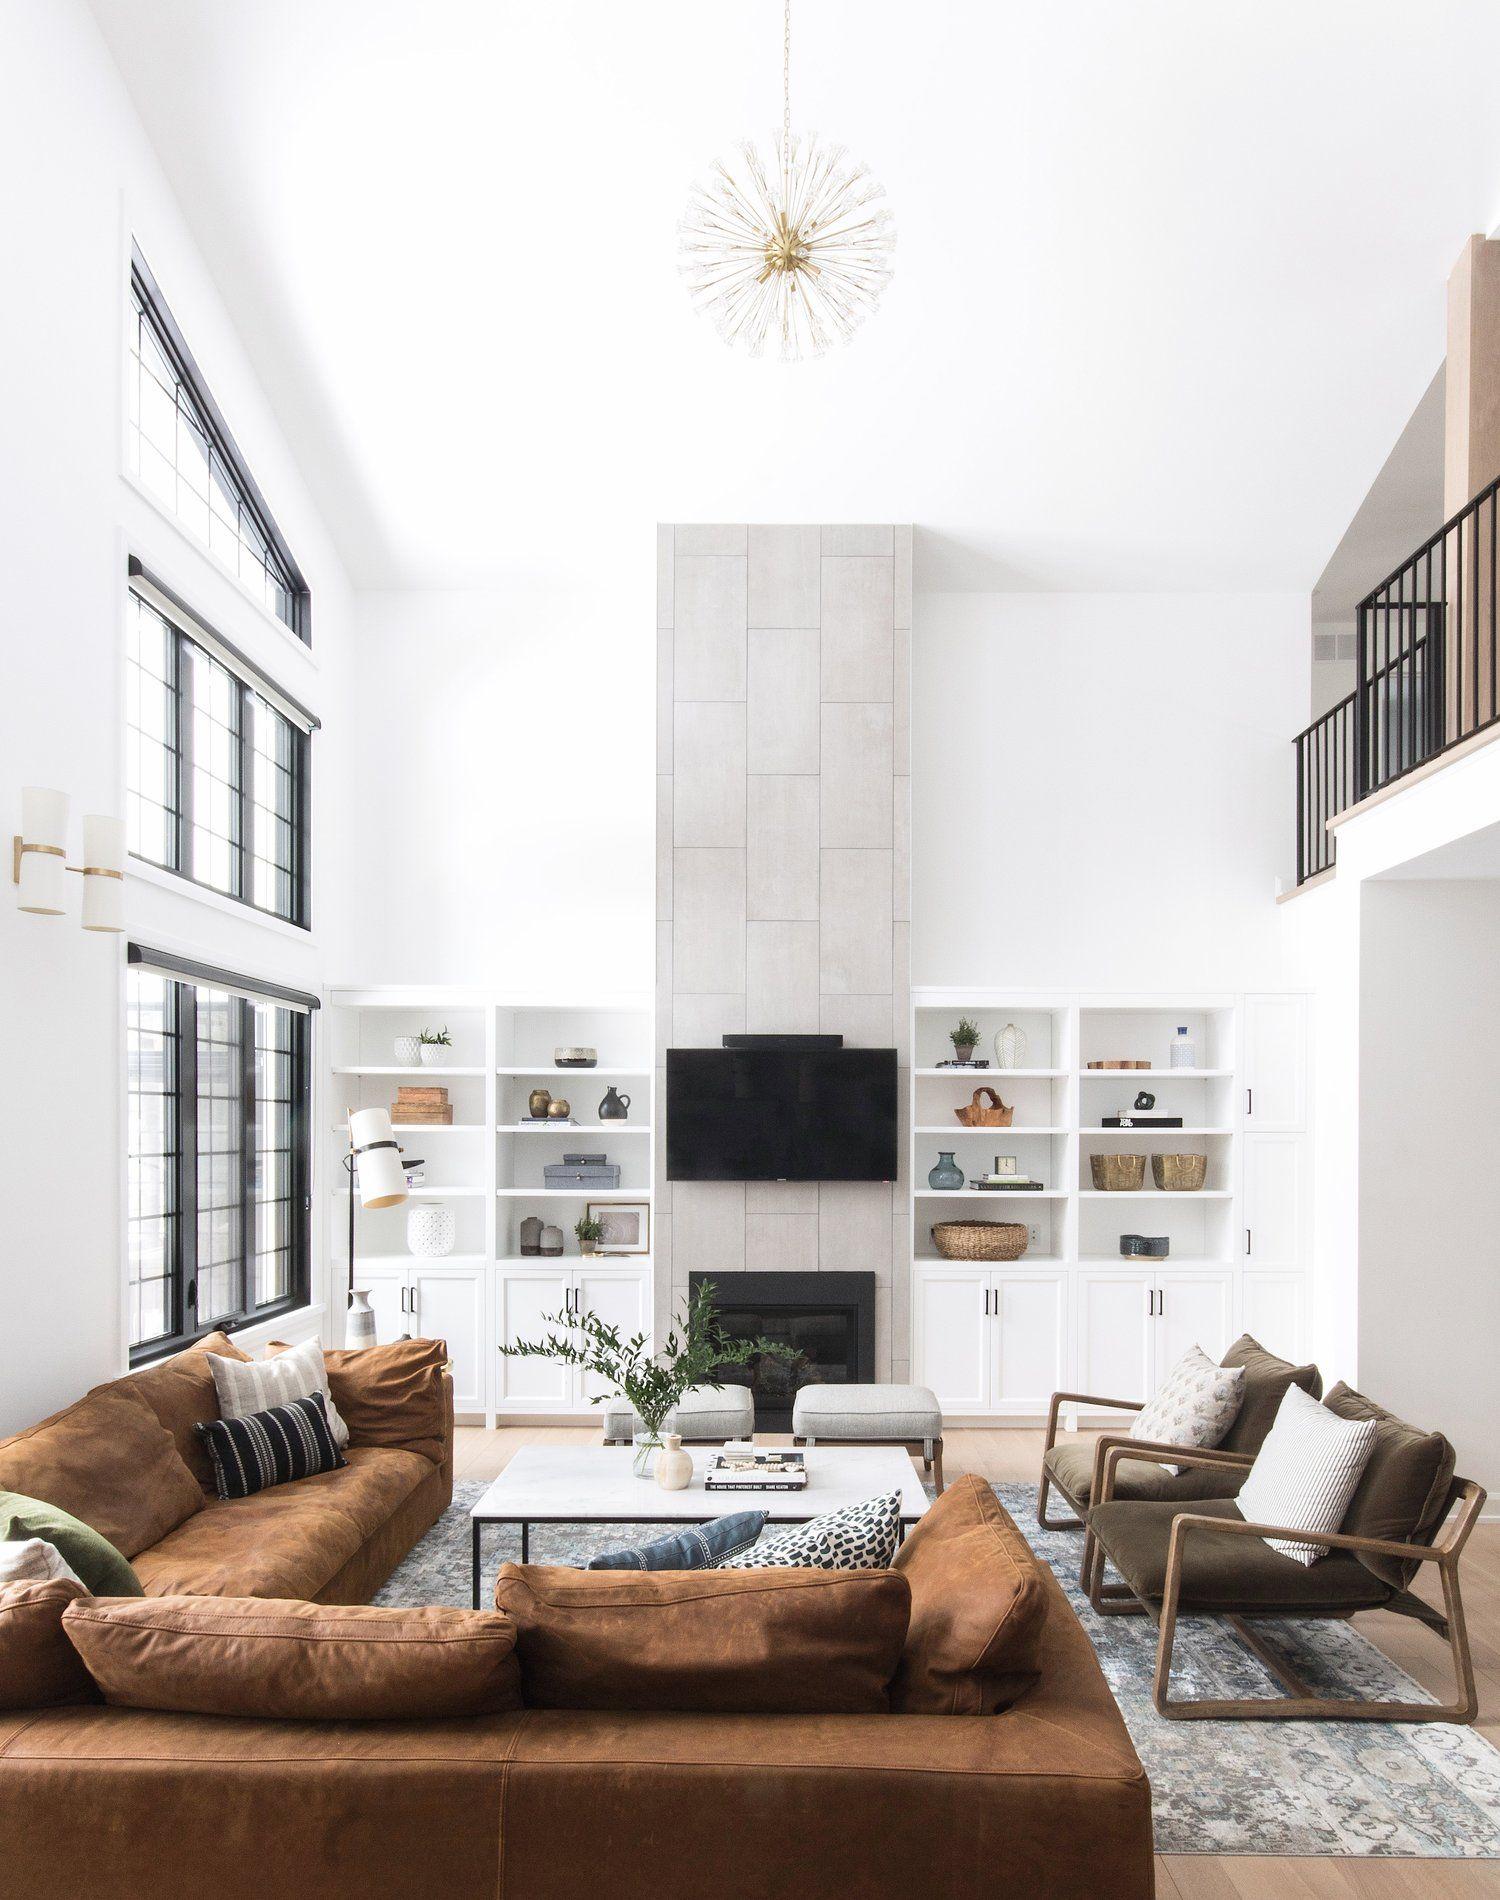 Inviting Modern Home Design By Ottawa Interior Design Firm Leclair